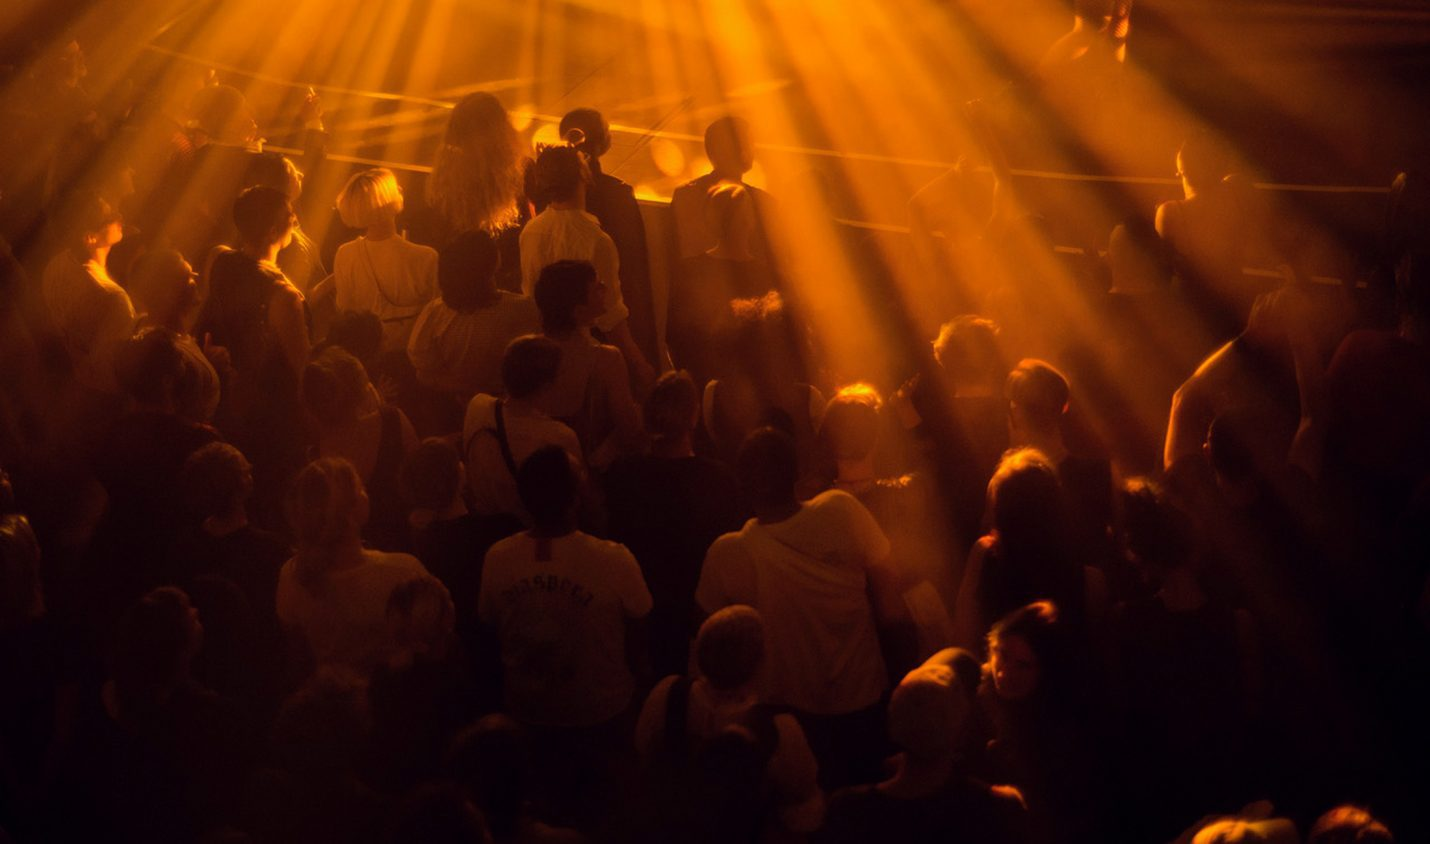 Tripbericht: Balance Club Culture Festival 2021 in Leipzig